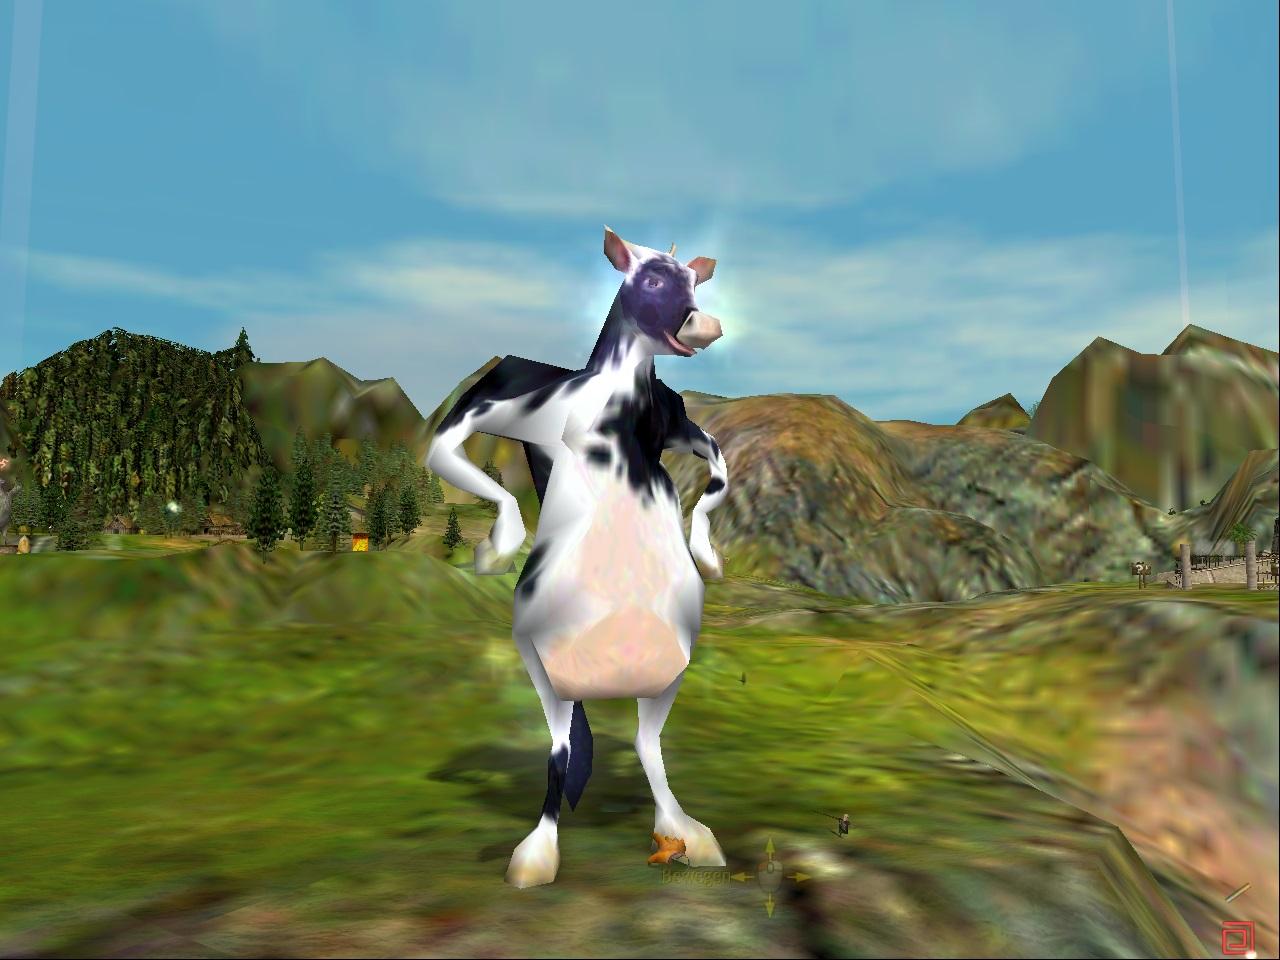 Black-and-white cows: description and characteristics 51